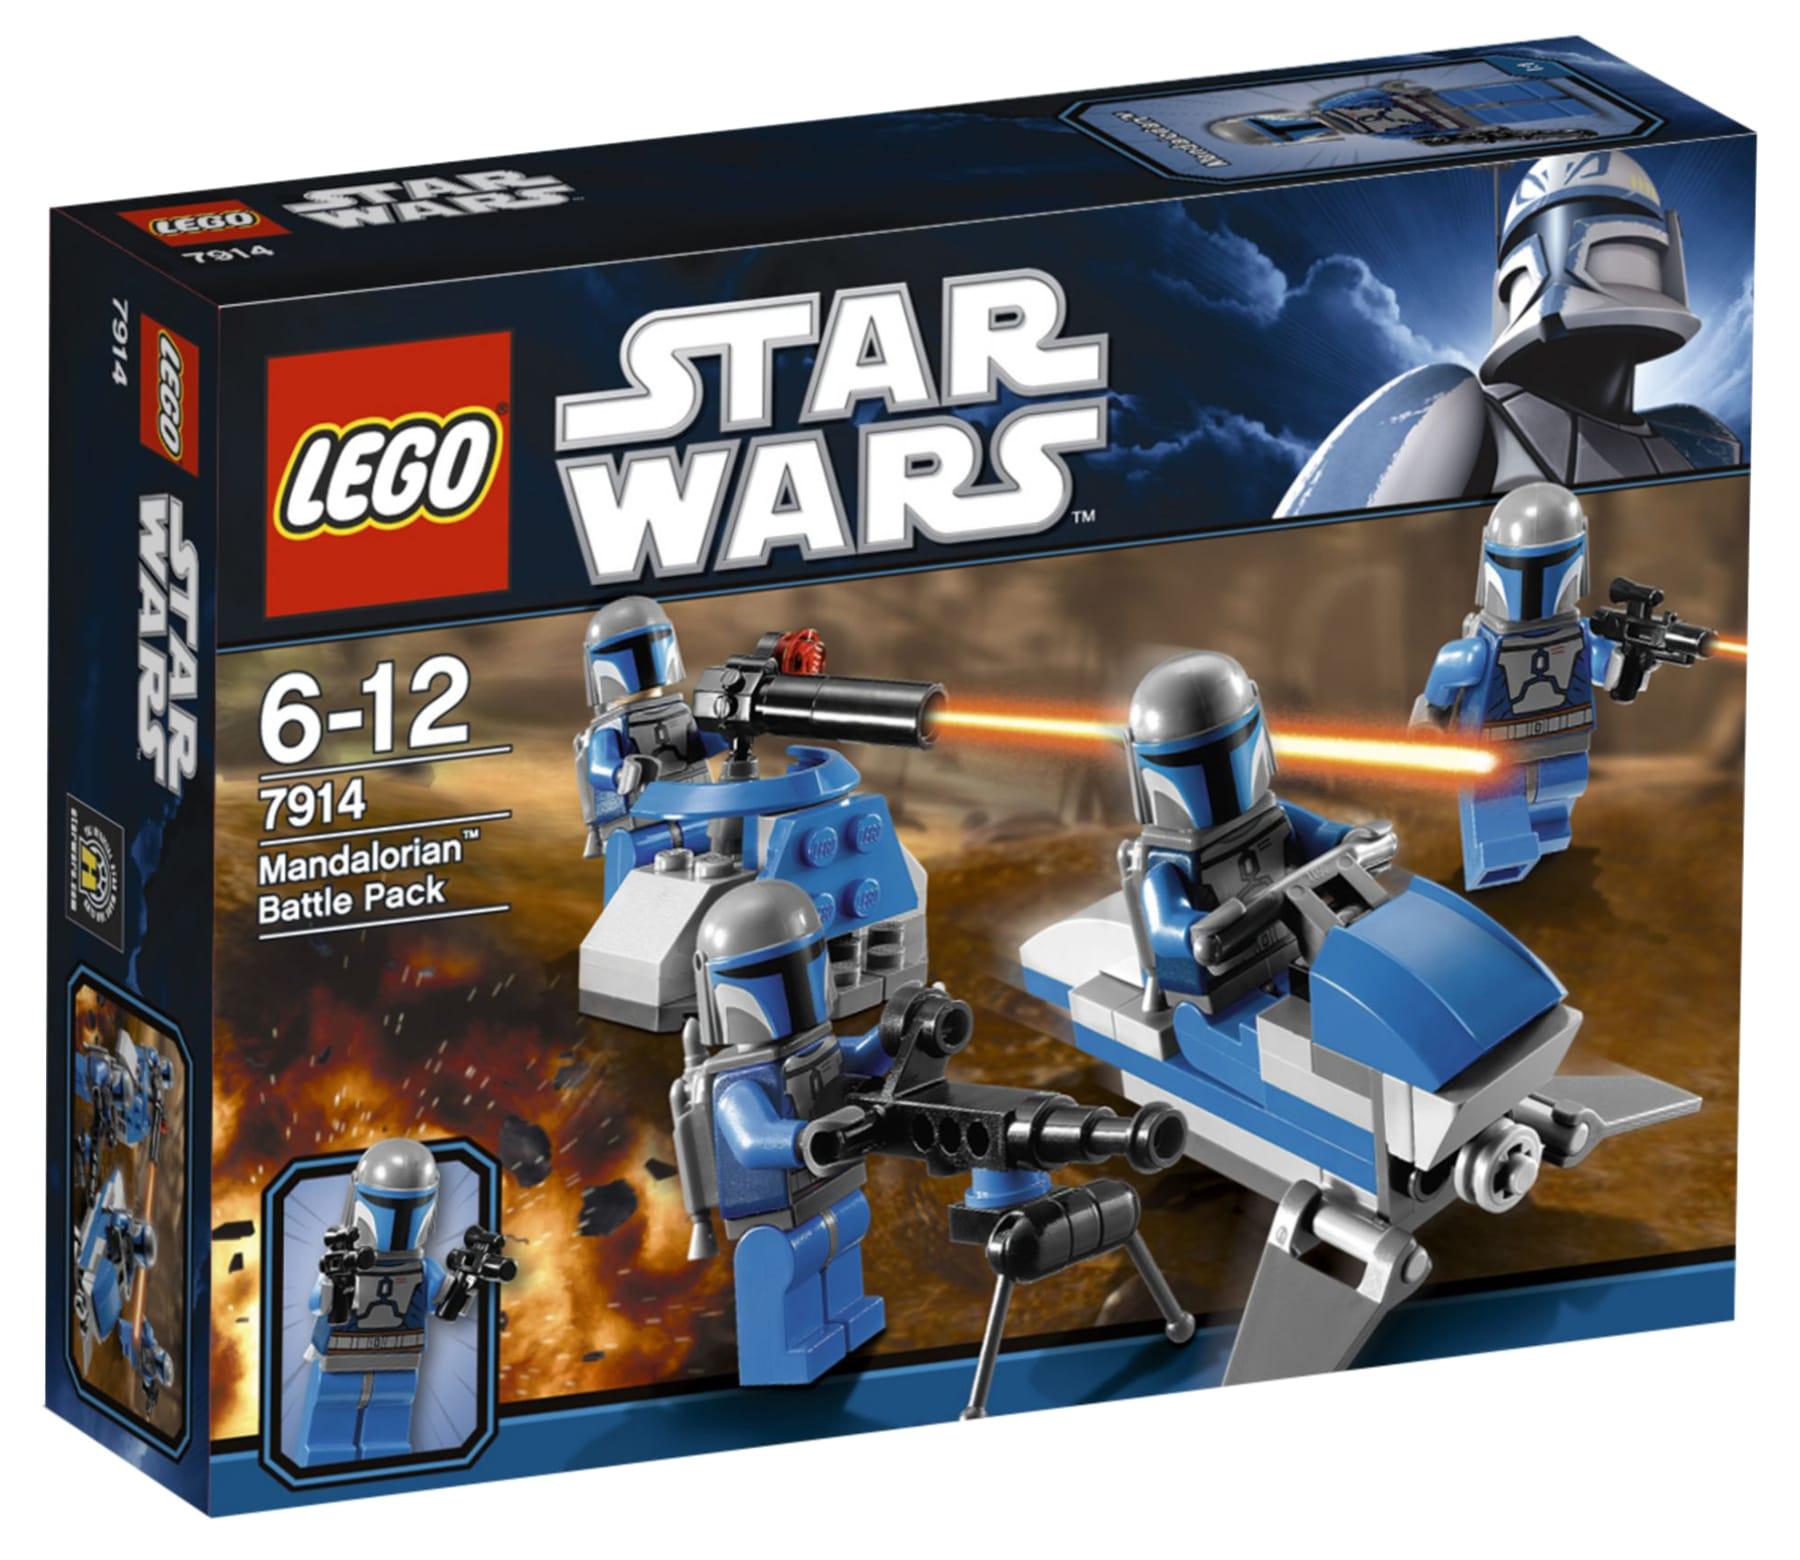 LEGO Star Wars7914 Mandalorian Battle Pack Box